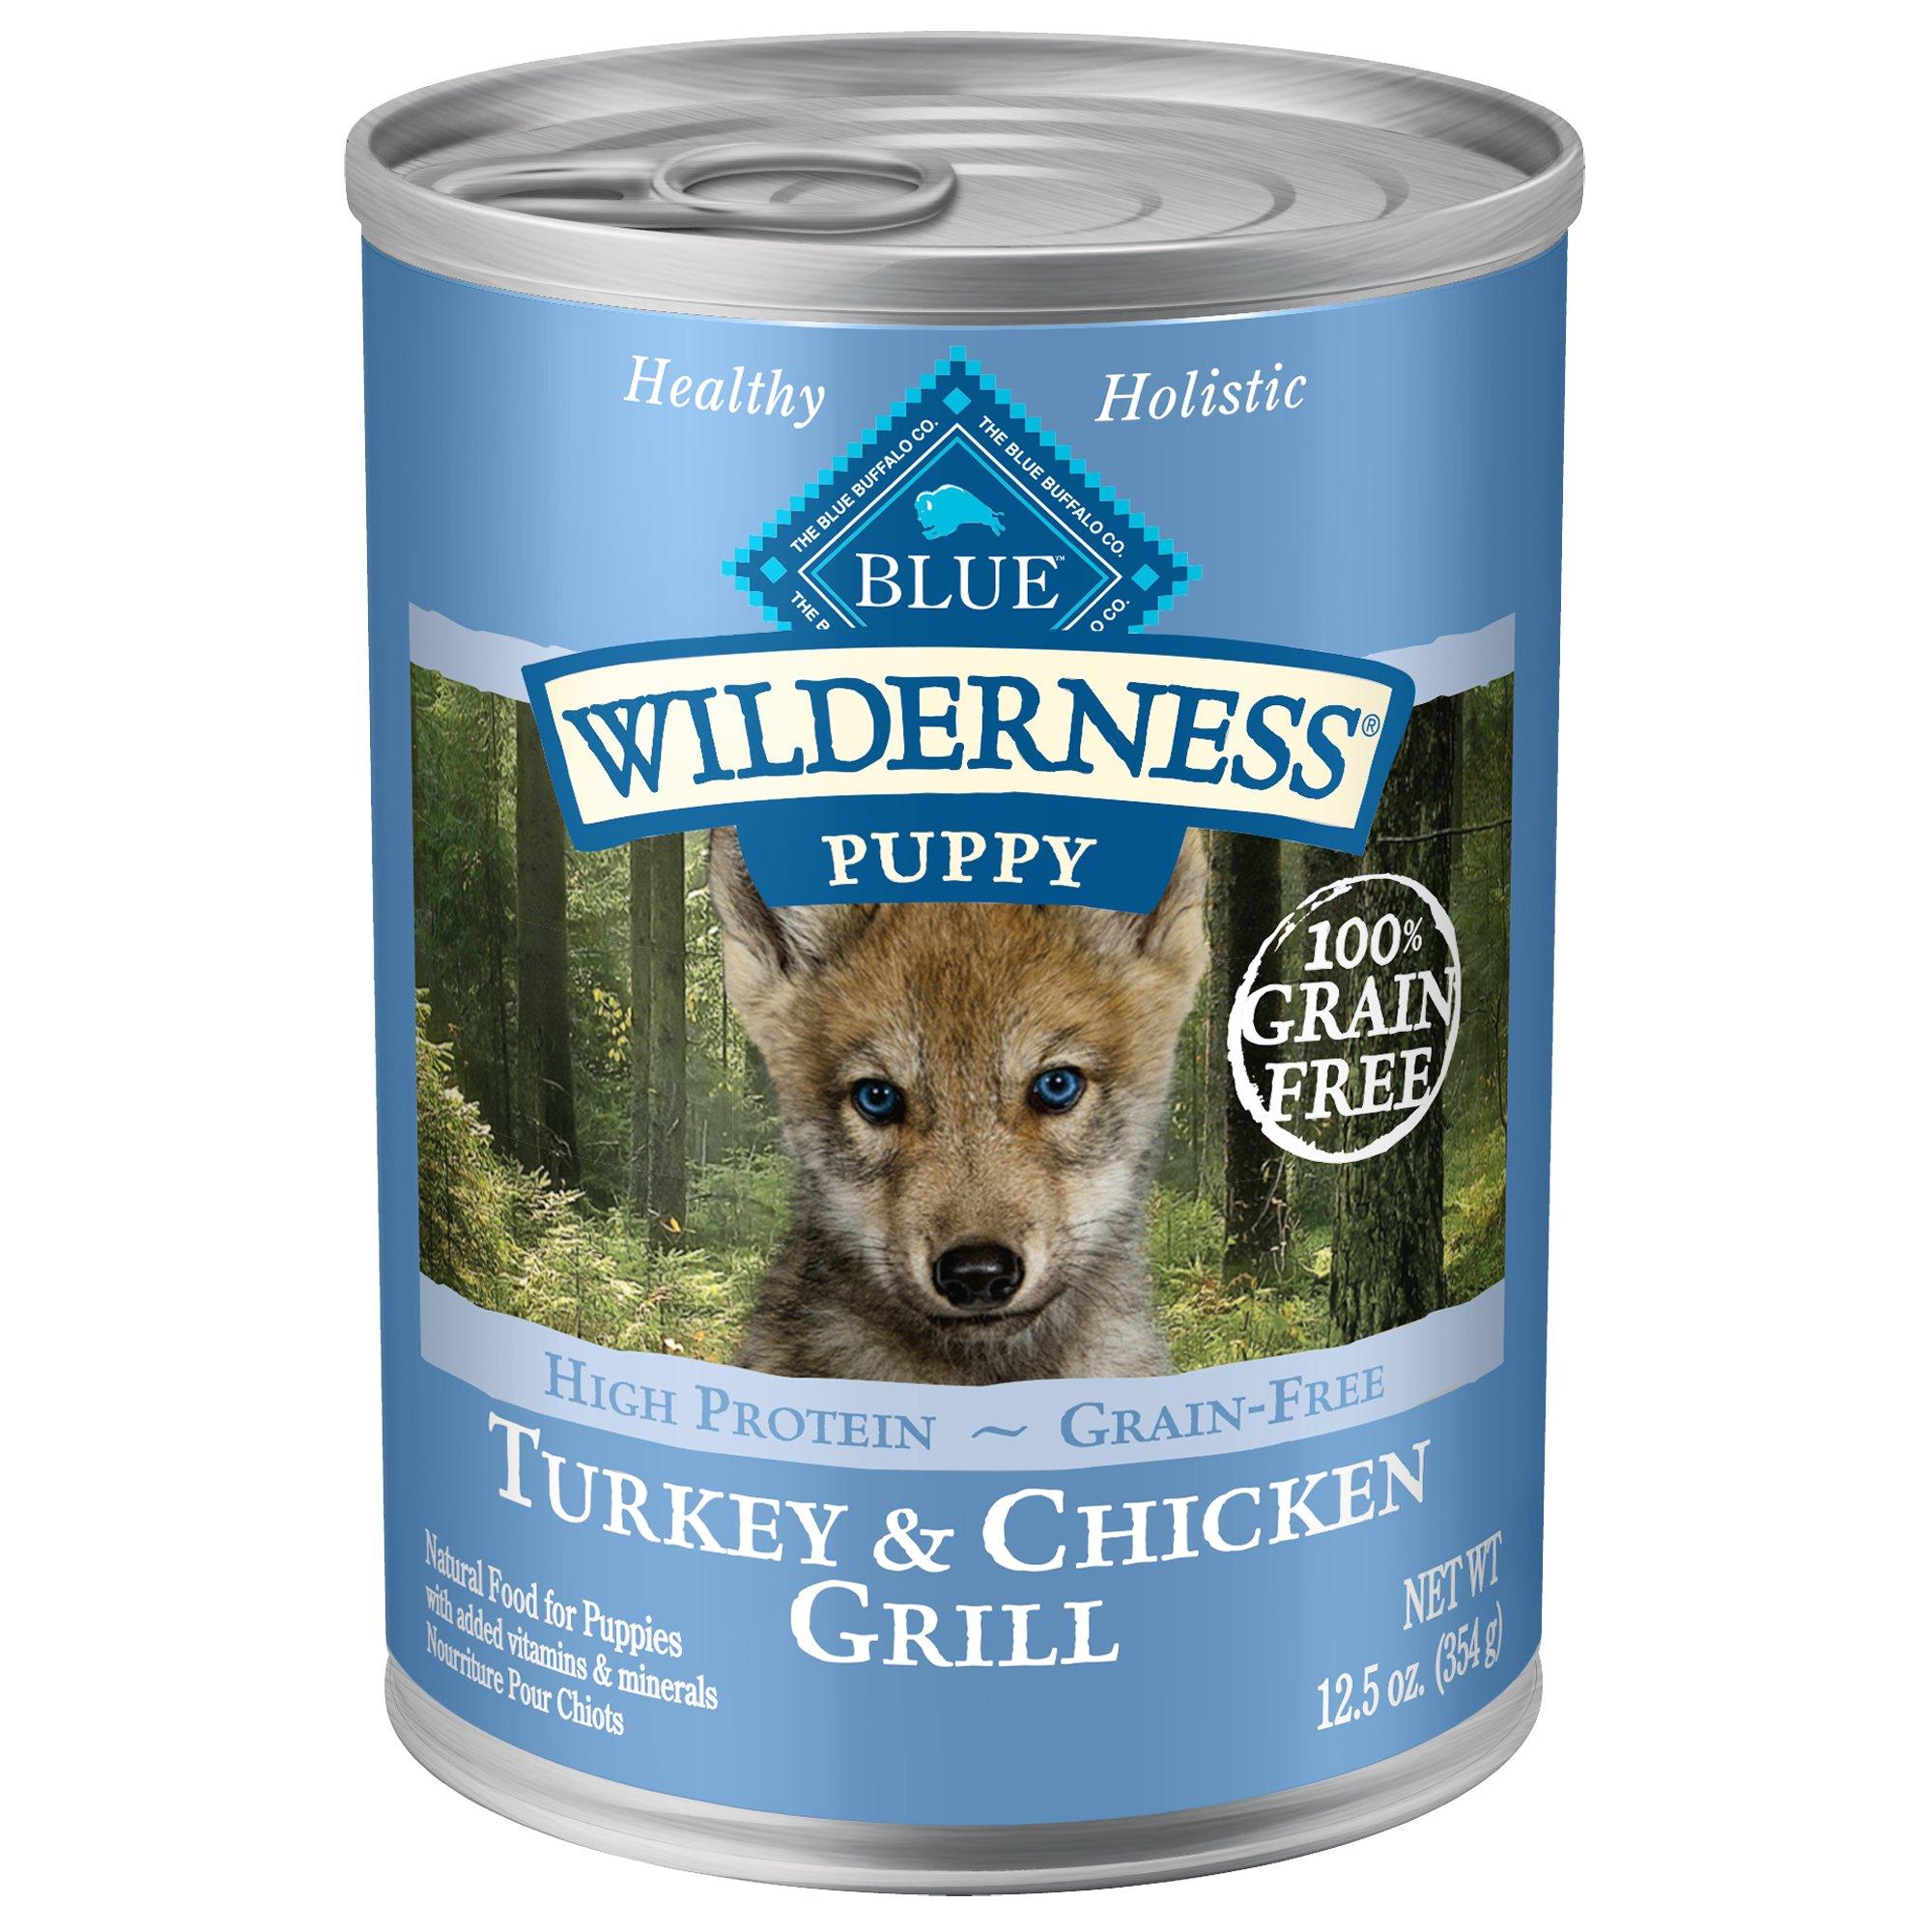 Blue Buffalo Wilderness Turkey & Chicken Canned Puppy Food